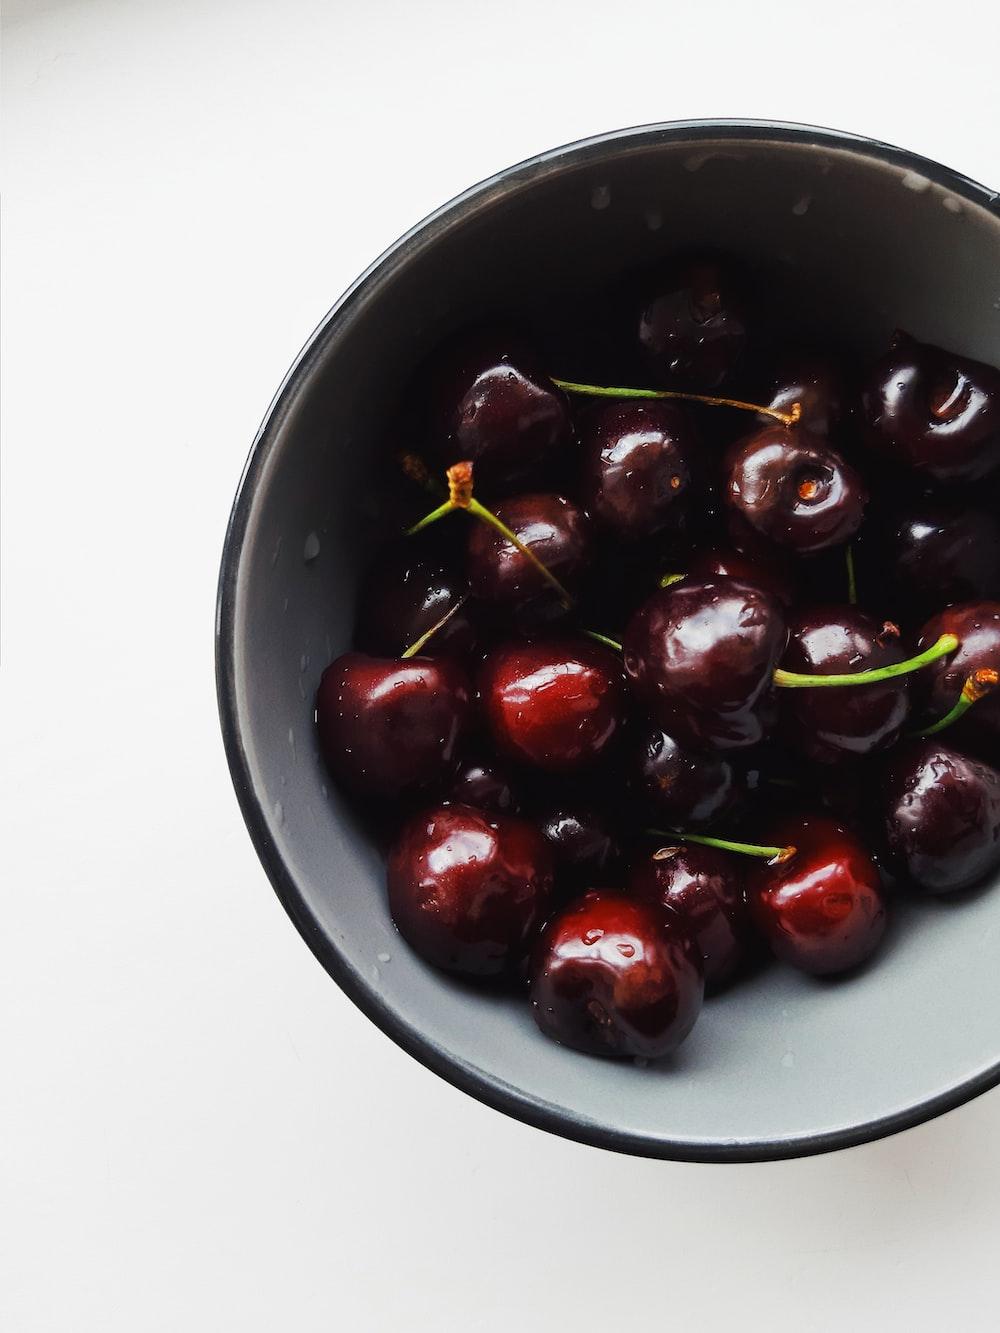 red cherries in bowl